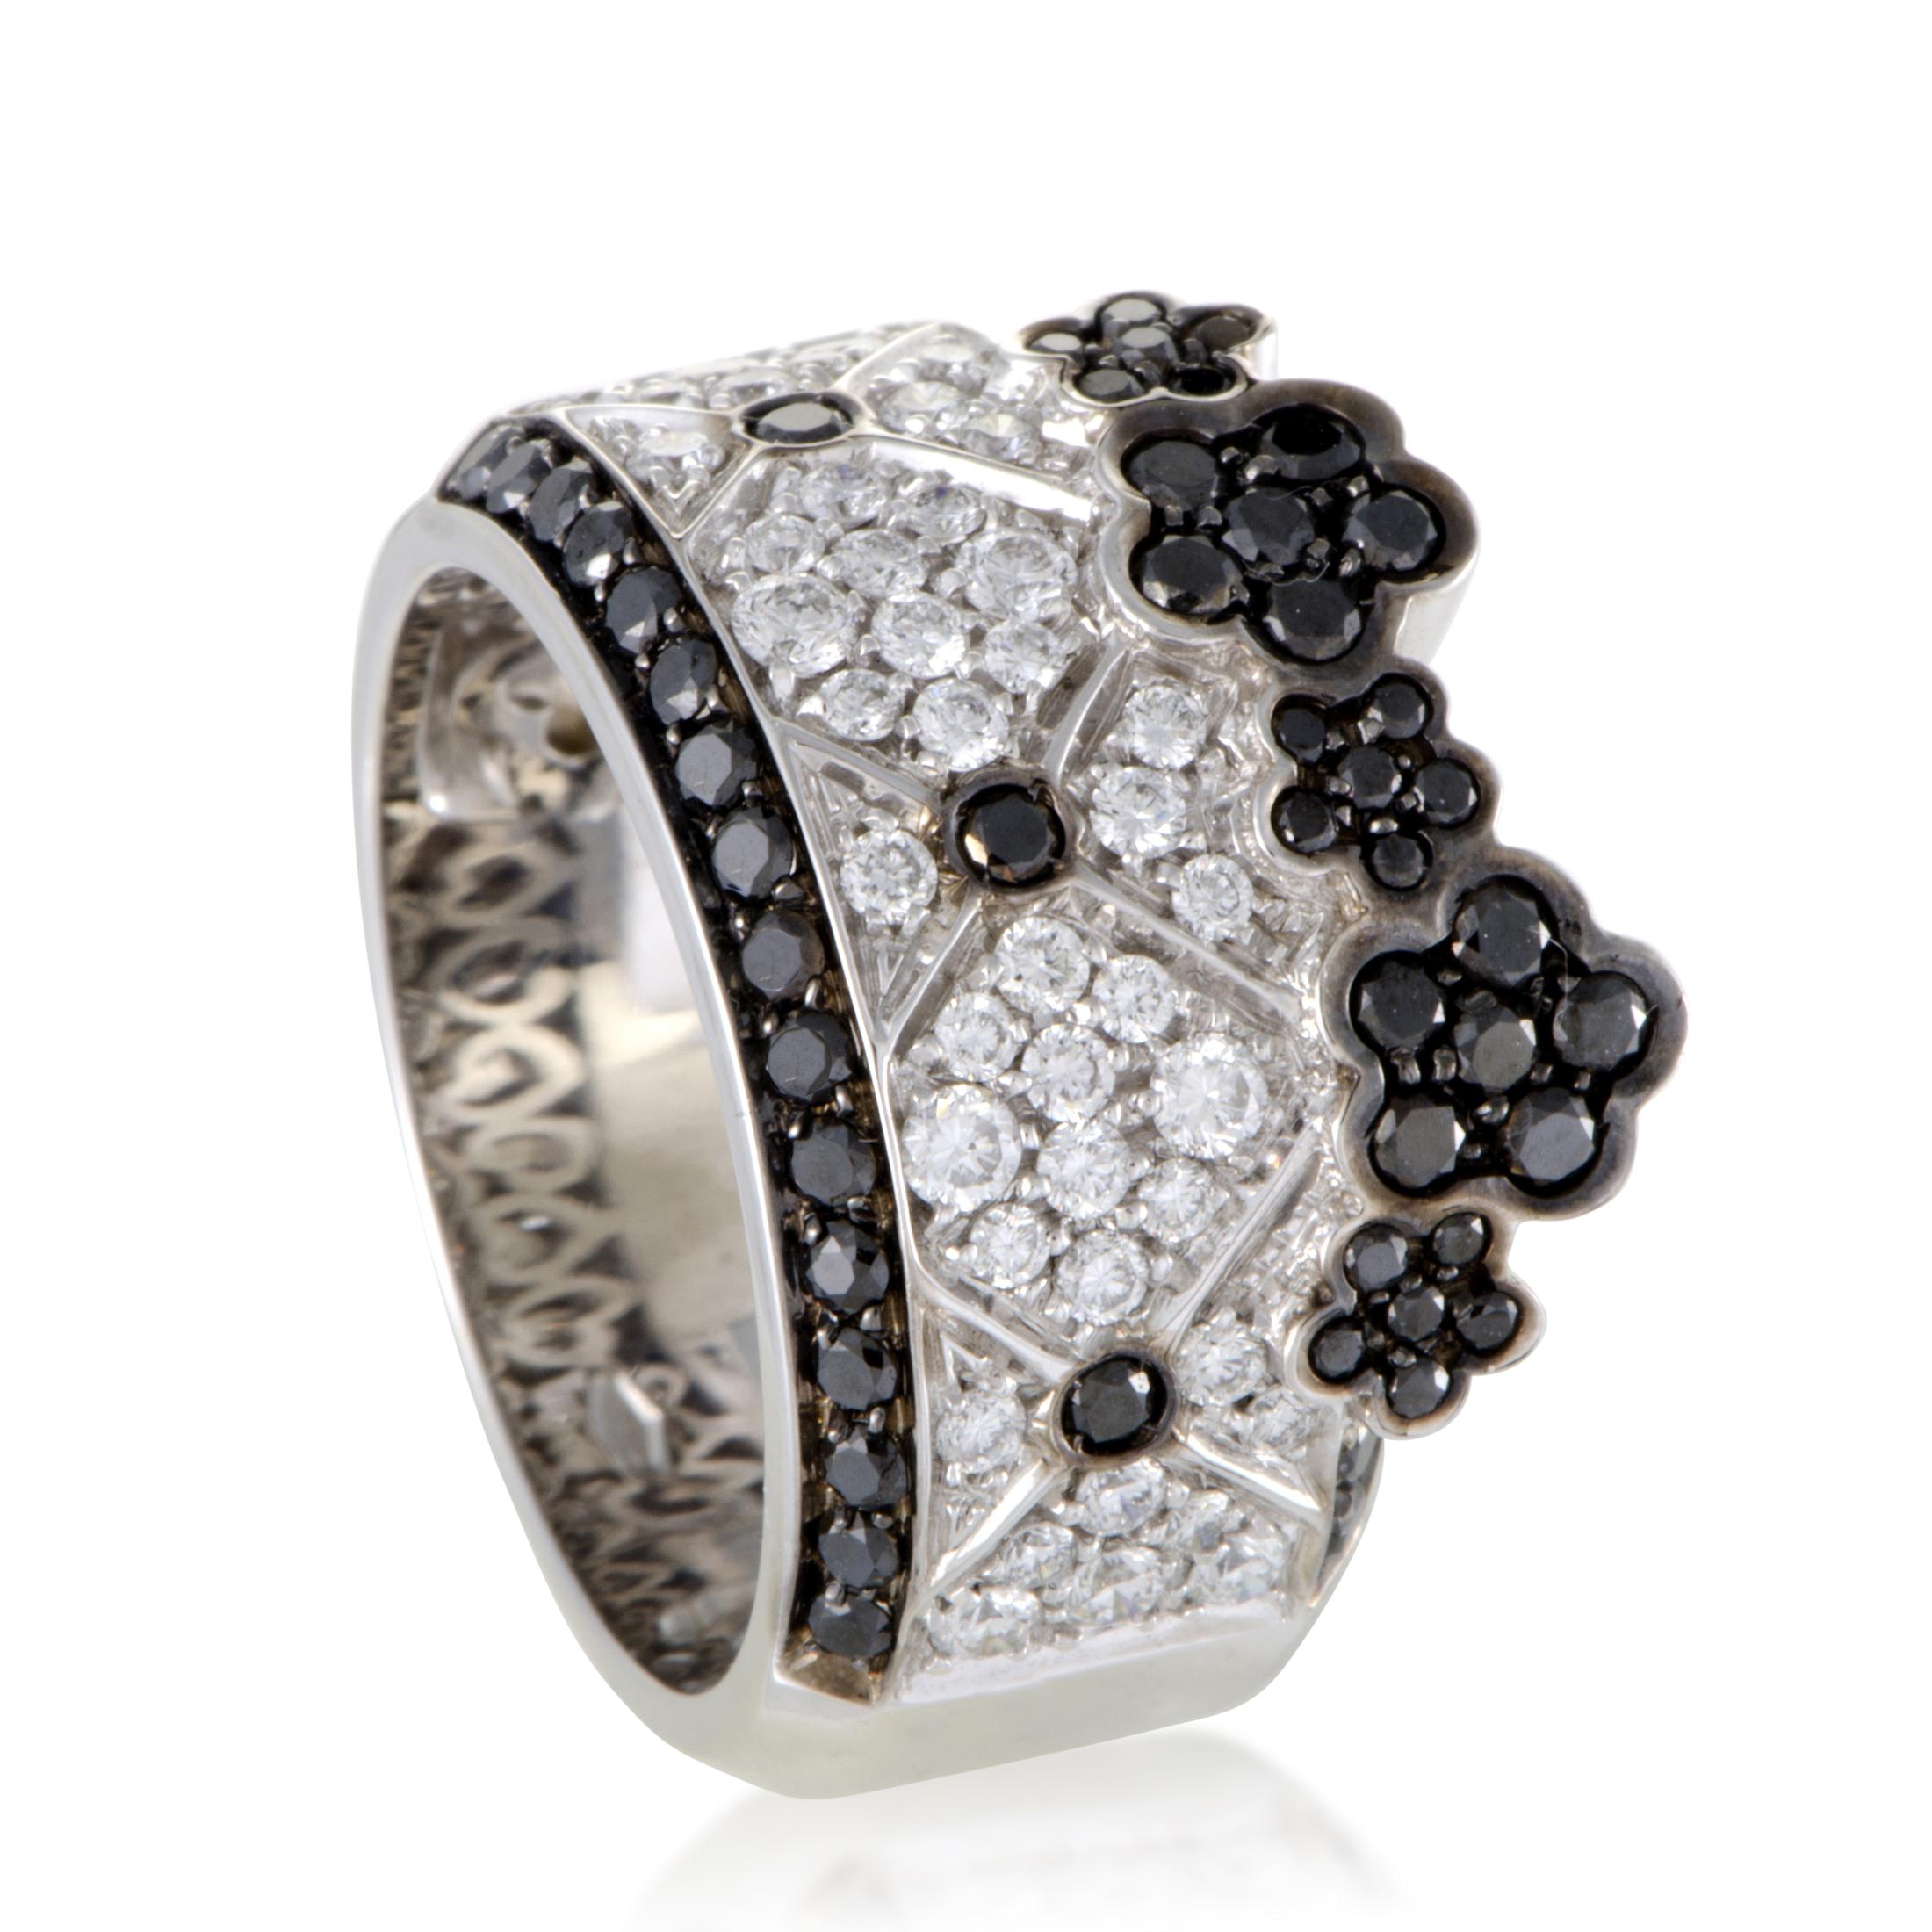 """""Pasquale Bruni Lulu 18K White Gold Black and White Diamond Band Ring"""""" 1366590"